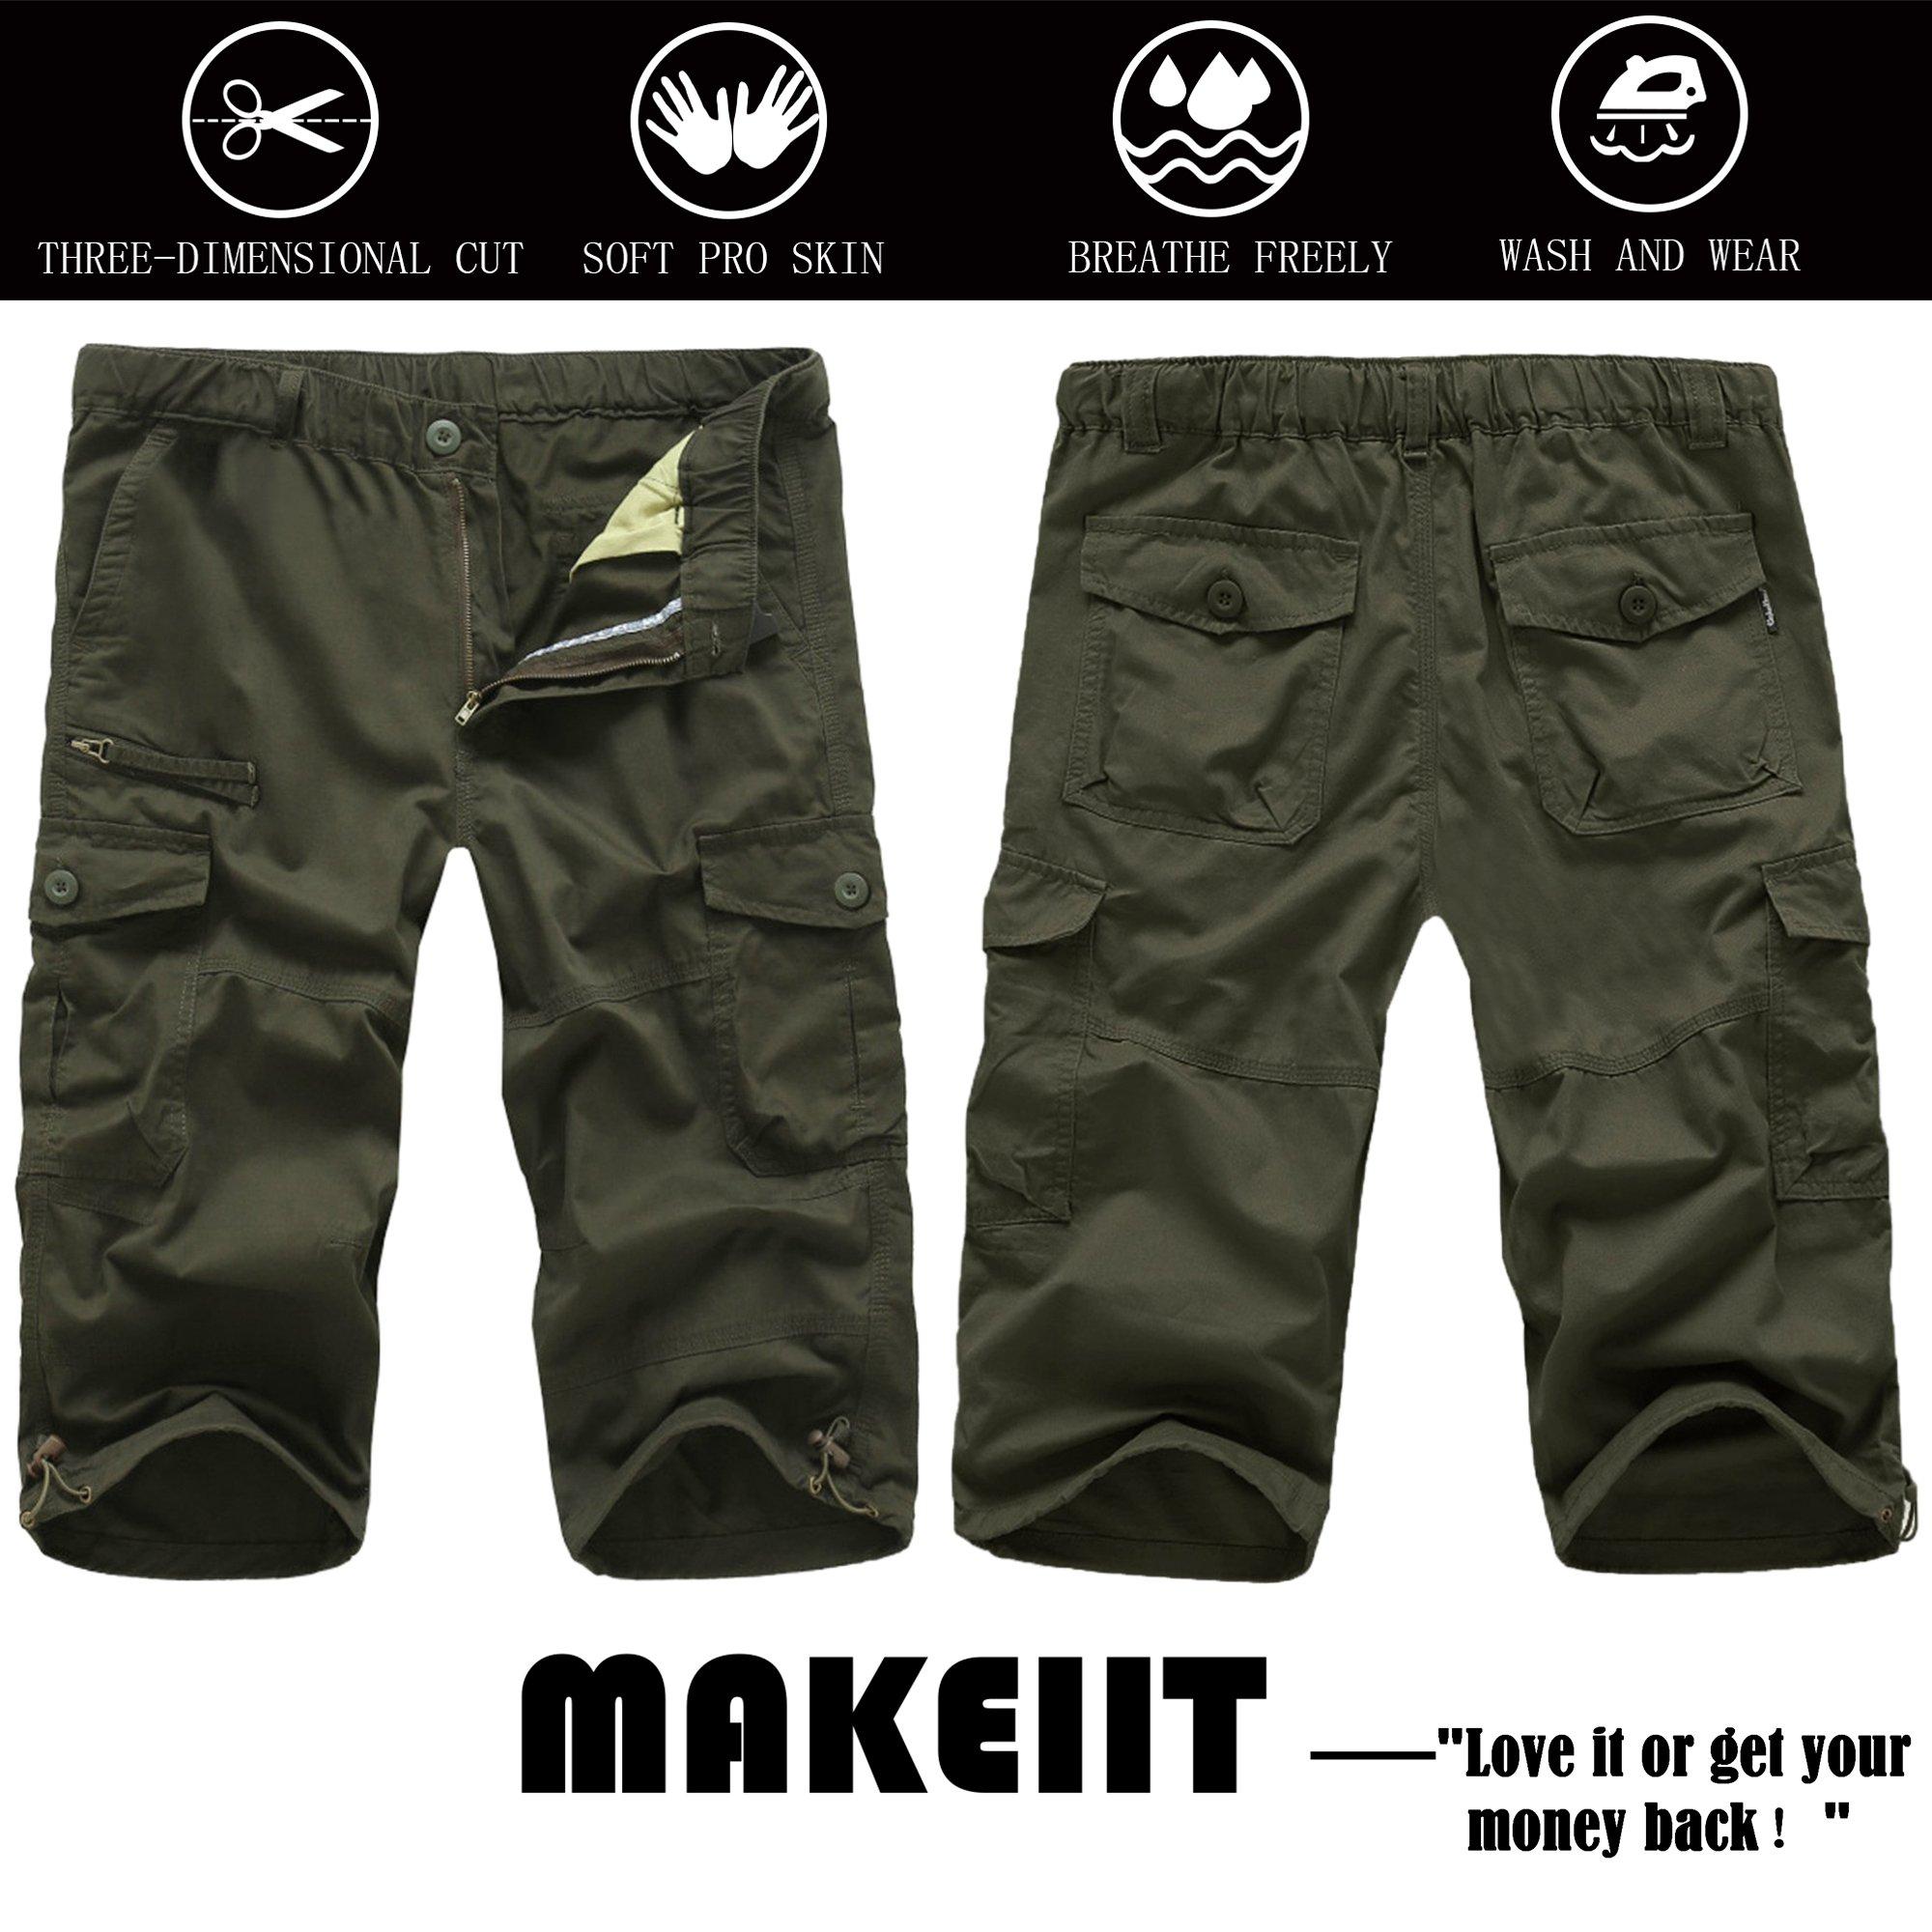 MAKEIIT Men's Juniors Cargo Shorts XXXL Cargo Shorts Dri Fit Cargo Shorts with Multi-Pocket by MAKEIIT (Image #6)